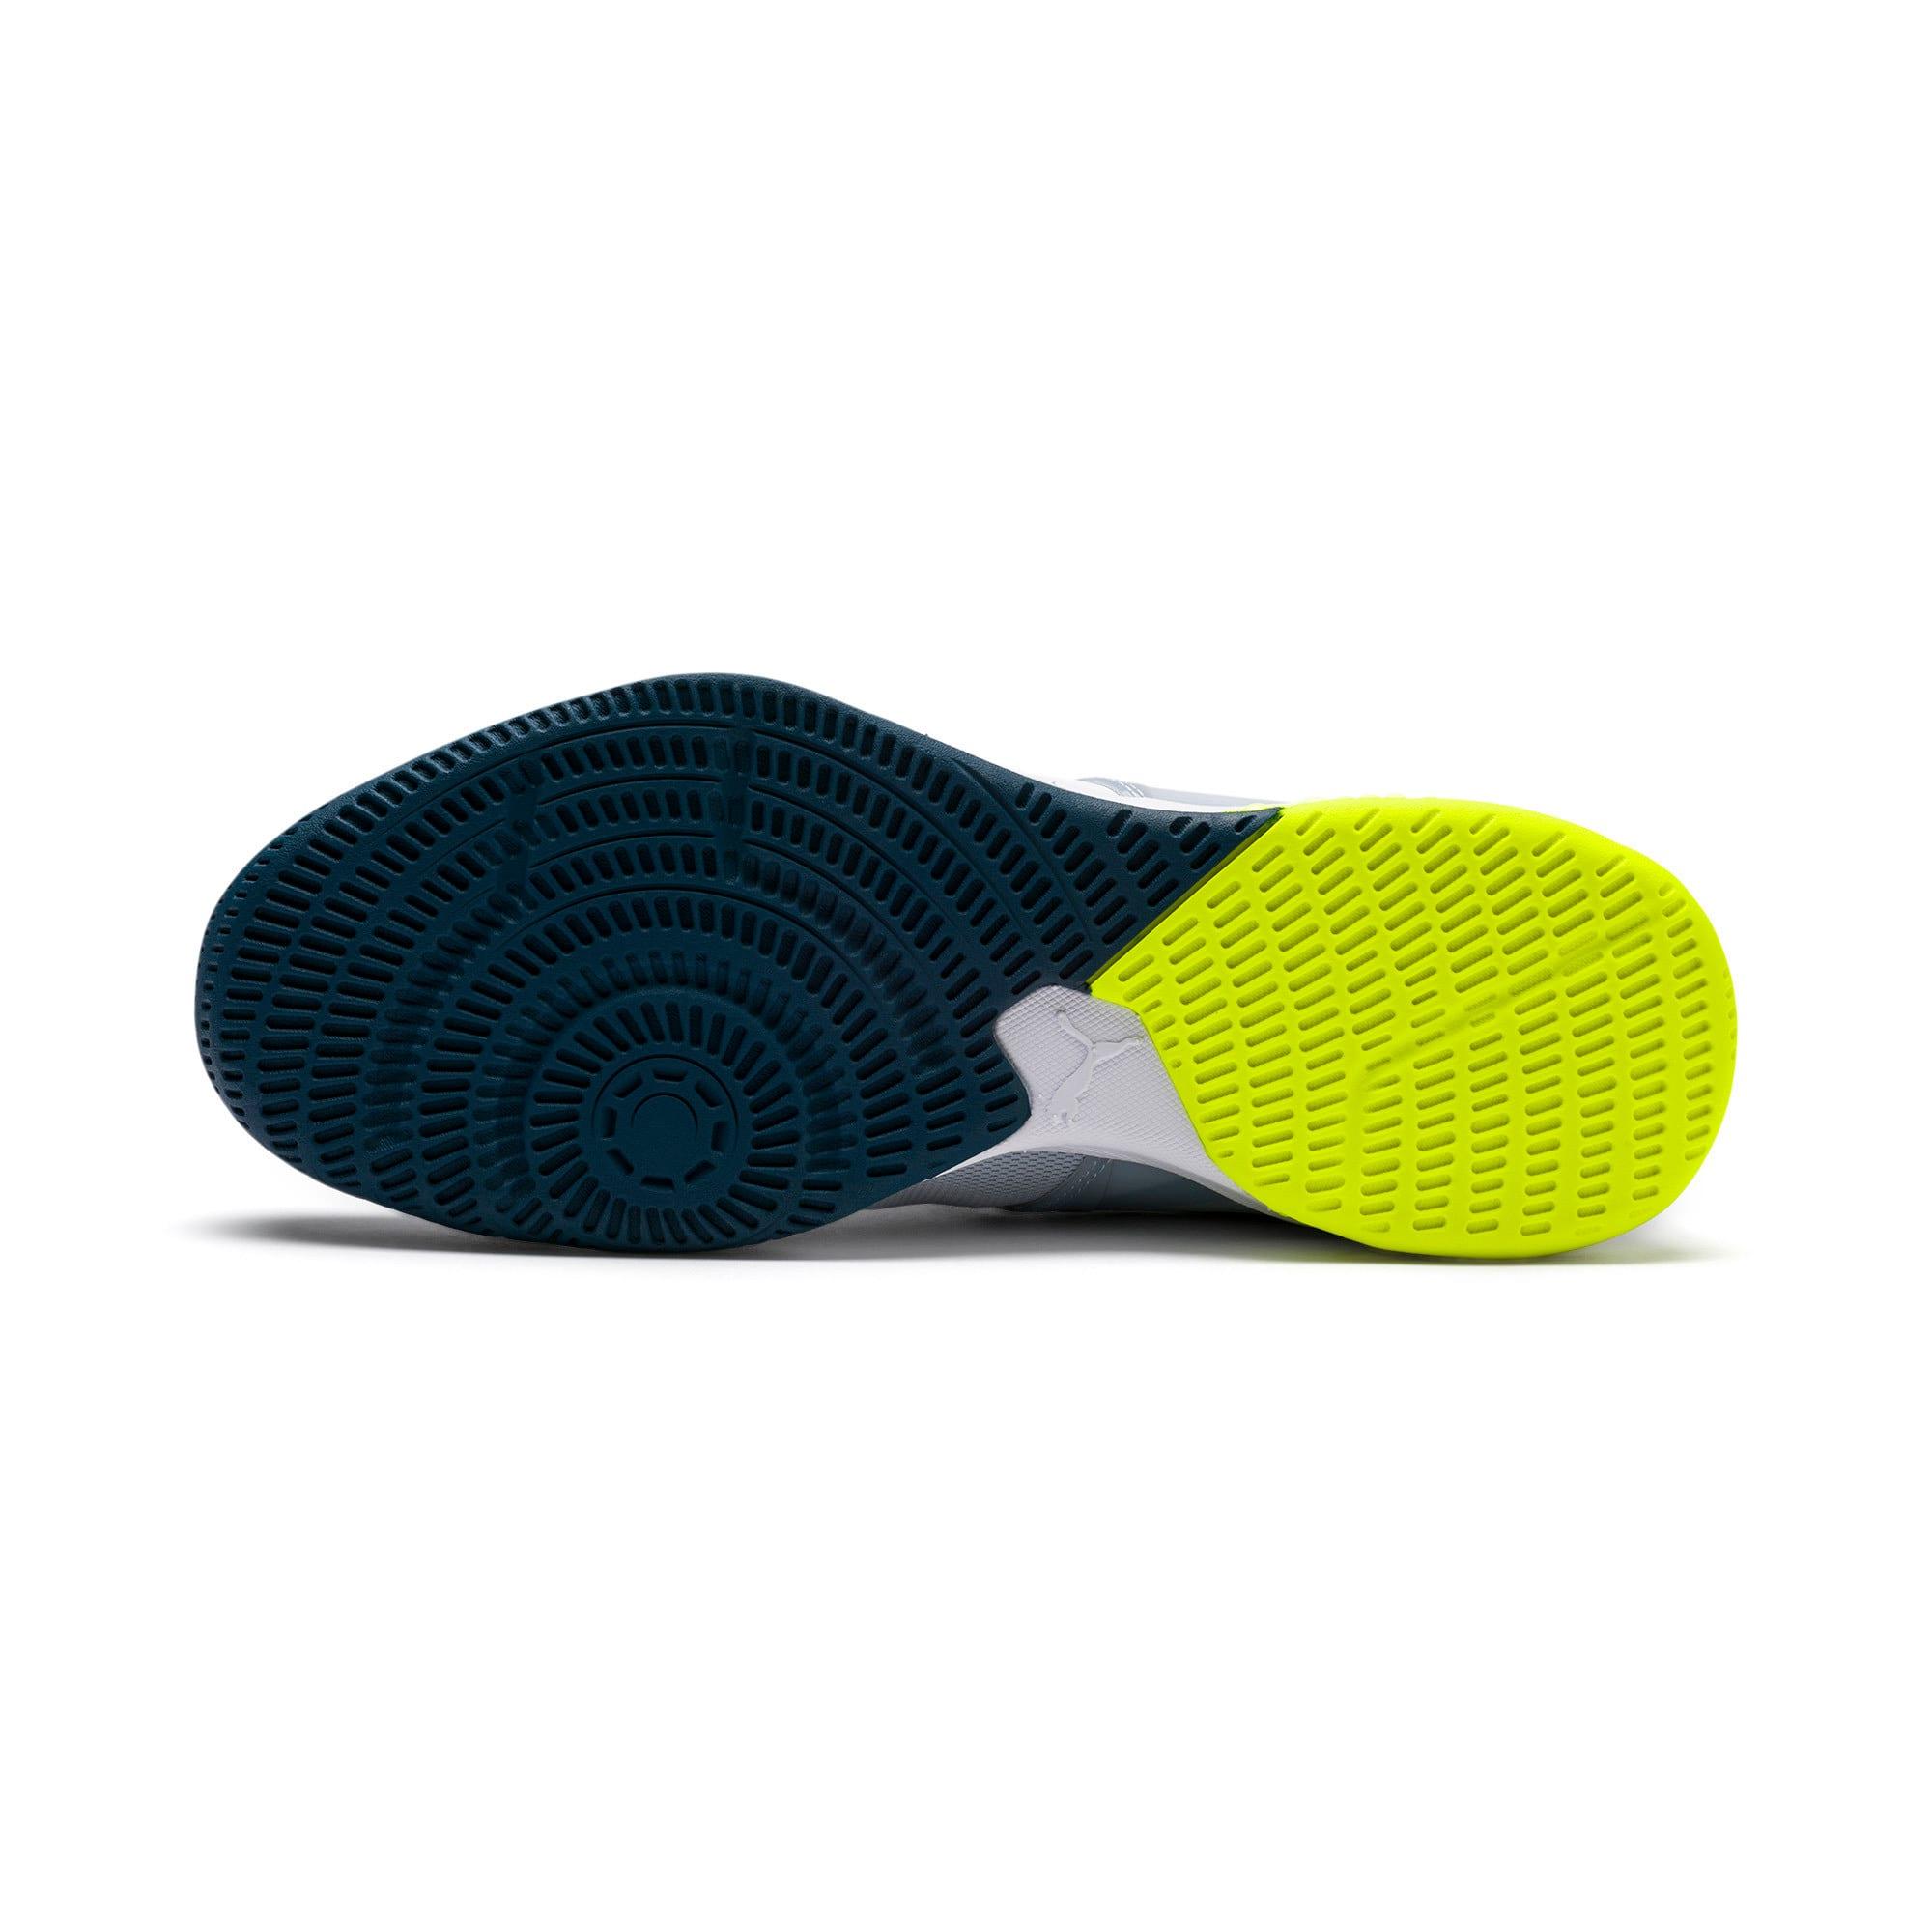 Thumbnail 6 of Explode XT Hybrid 2 Handball Shoes, White-Grey-Yellow-Gibraltar, medium-IND